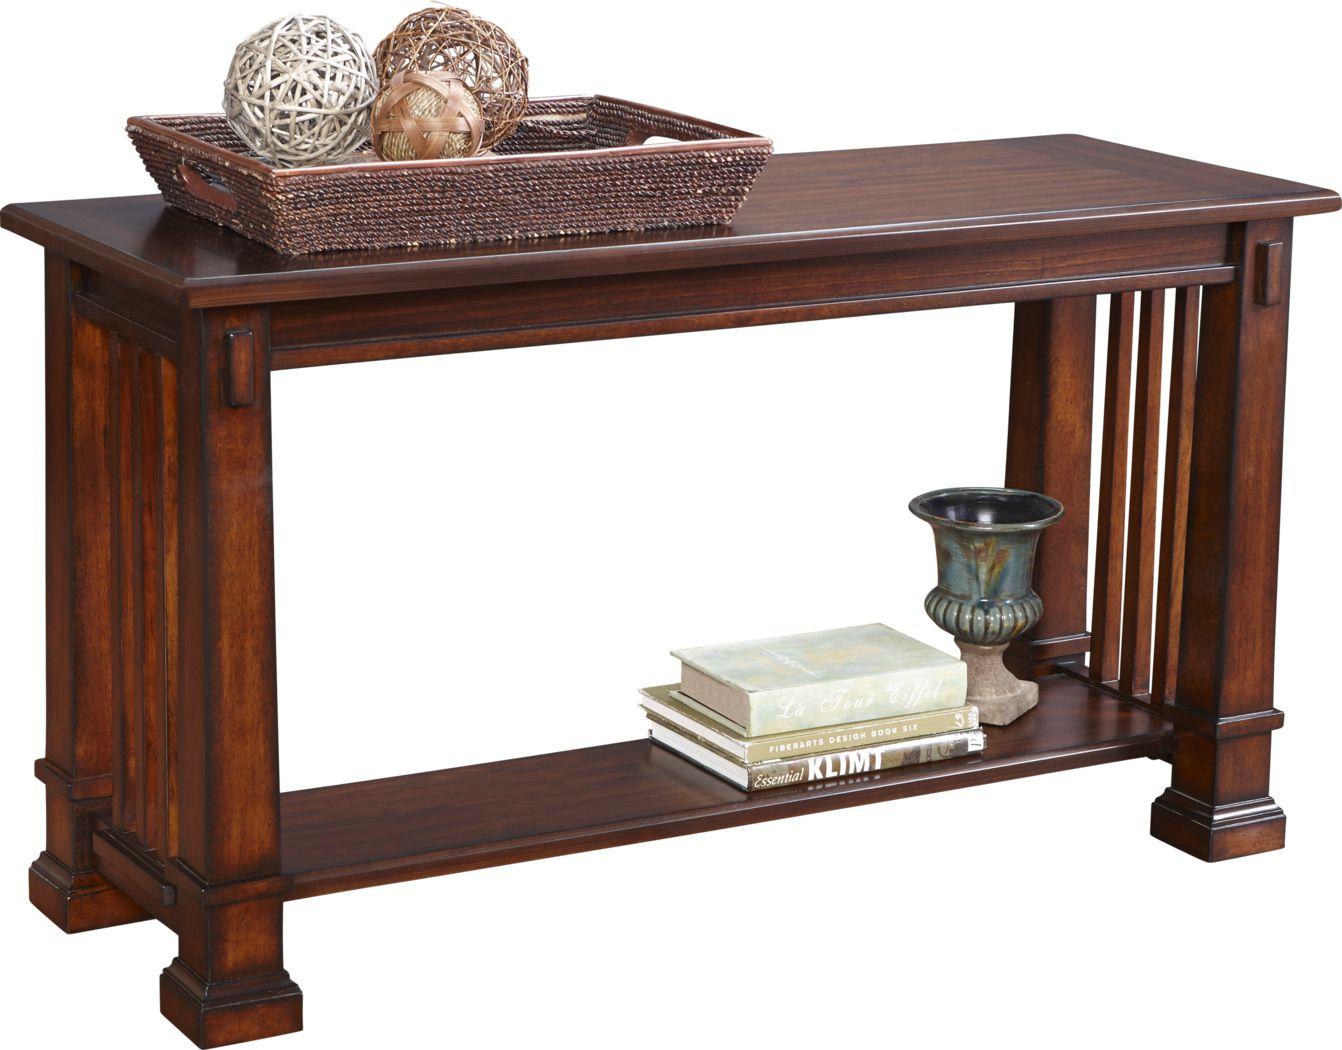 Clairfield Tobacco Sofa Table